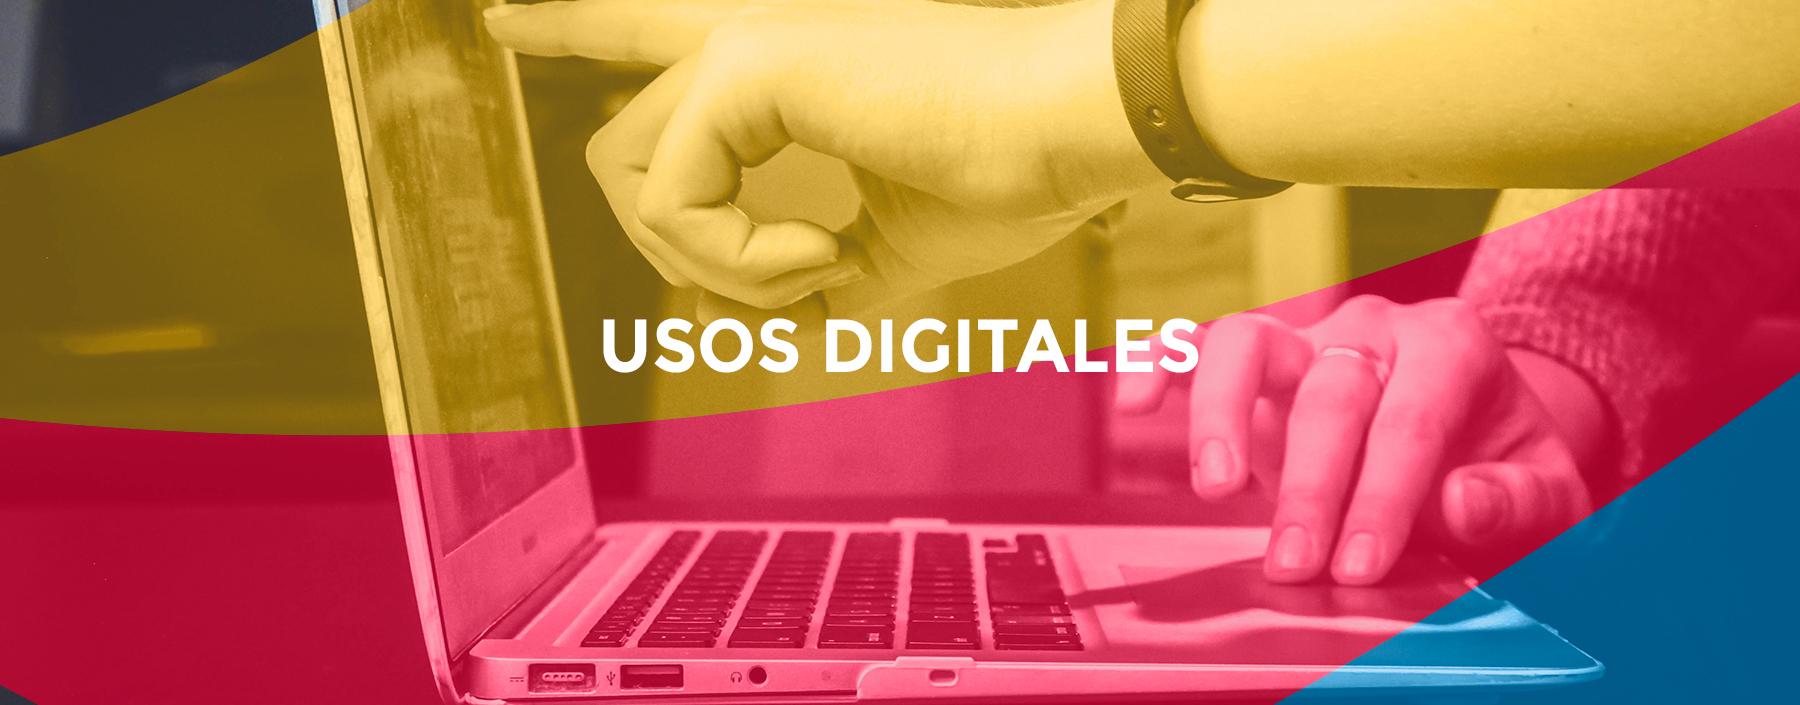 banner-usos-digitales